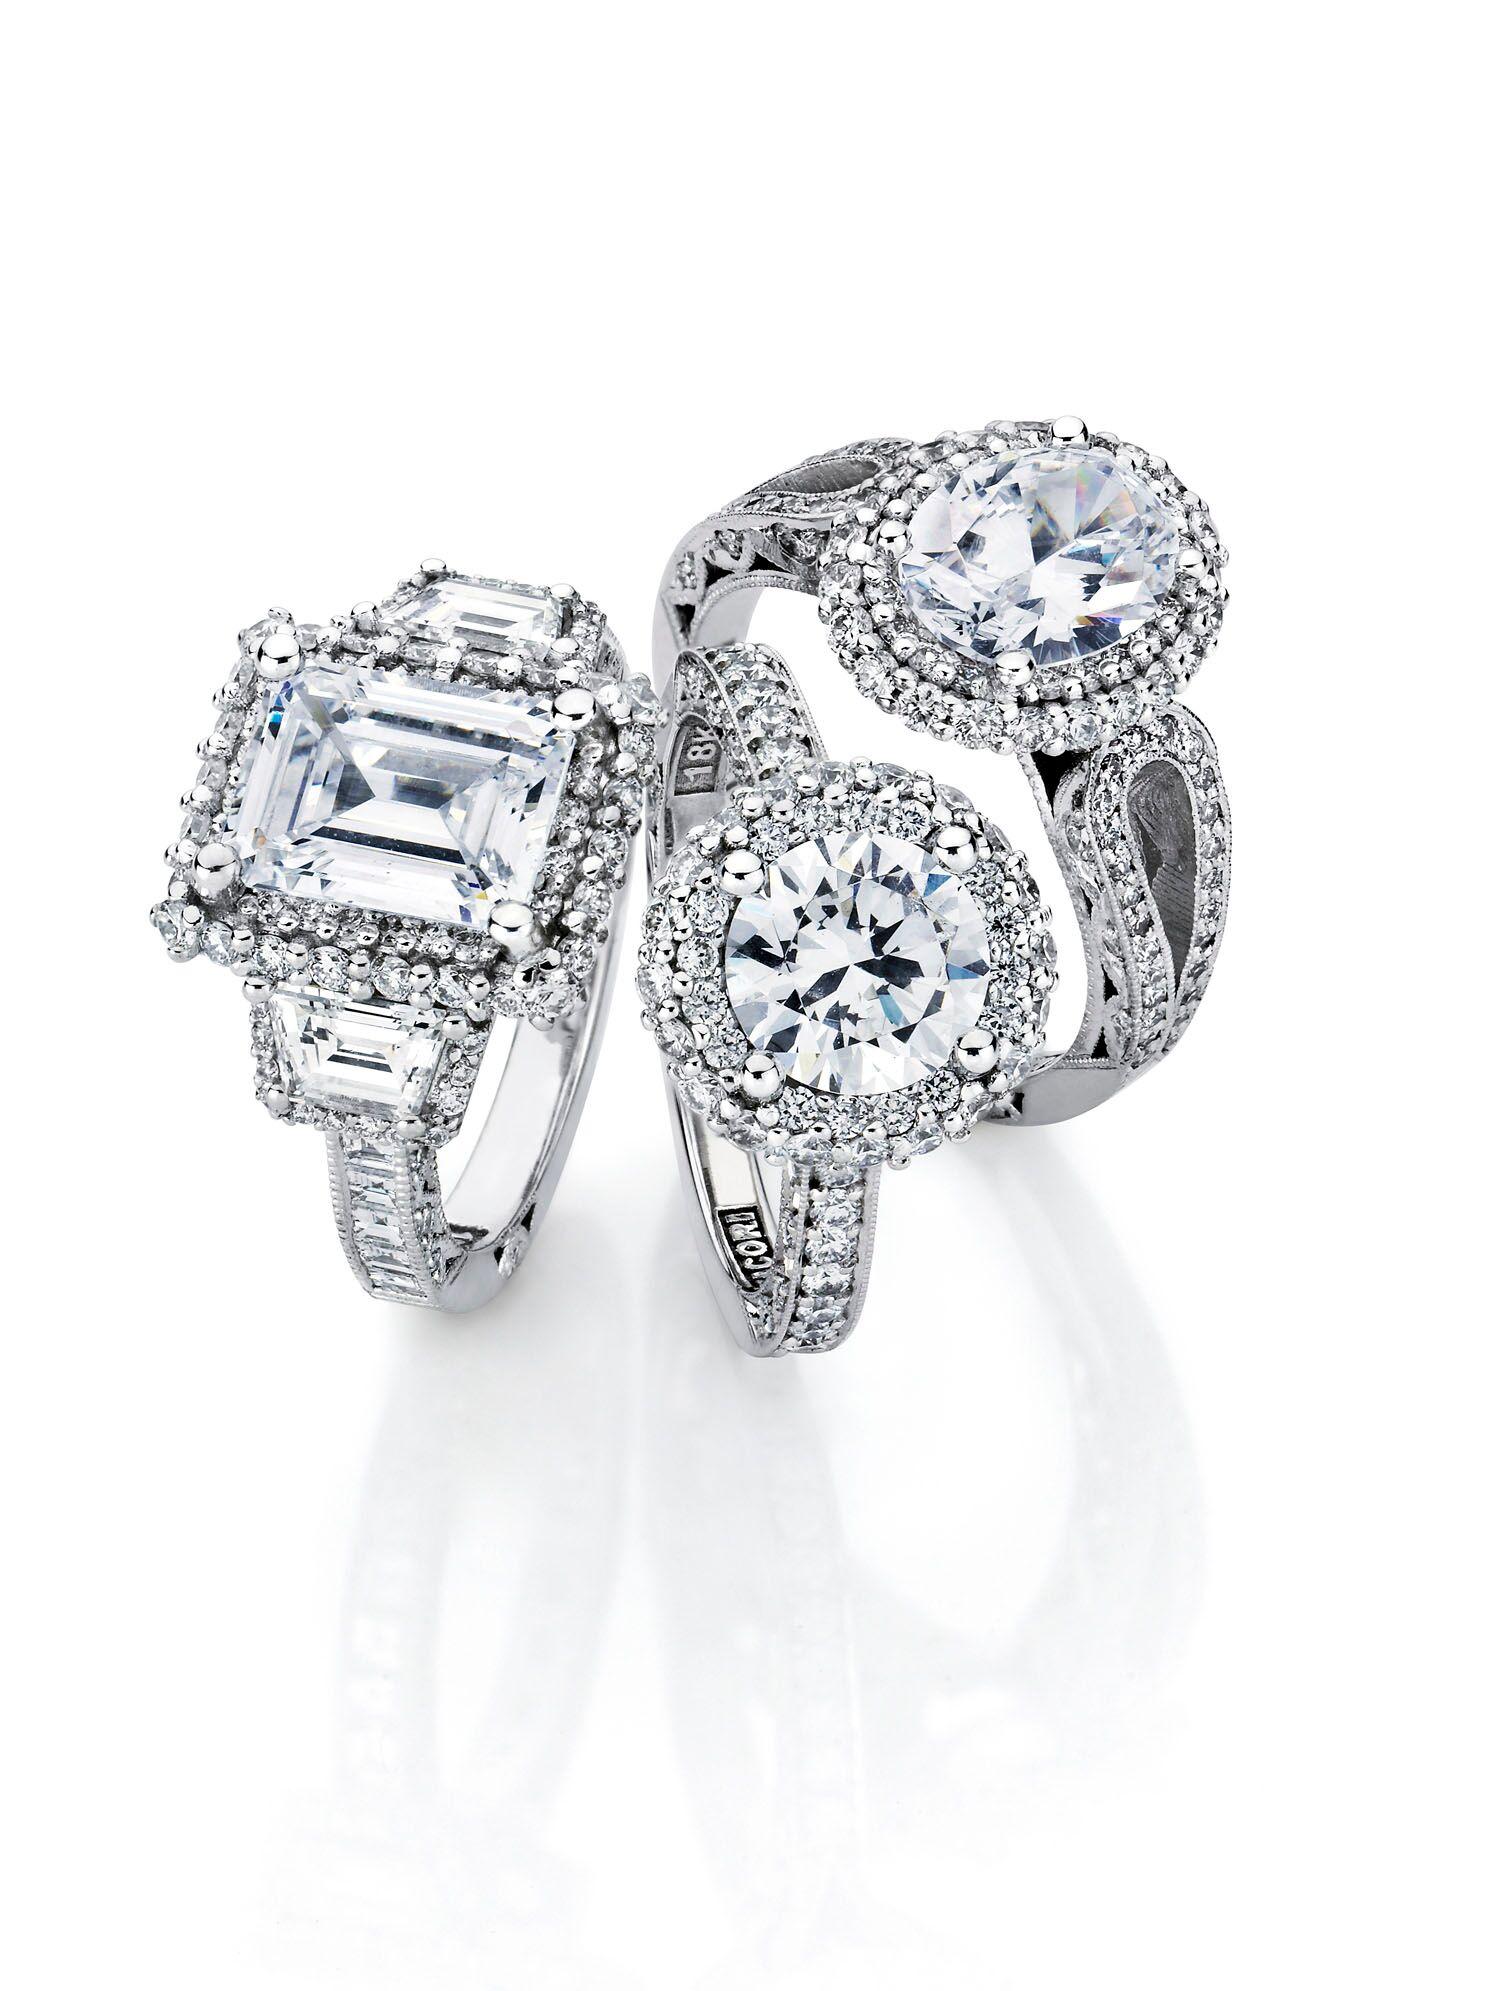 mervis diamond importers washington dc